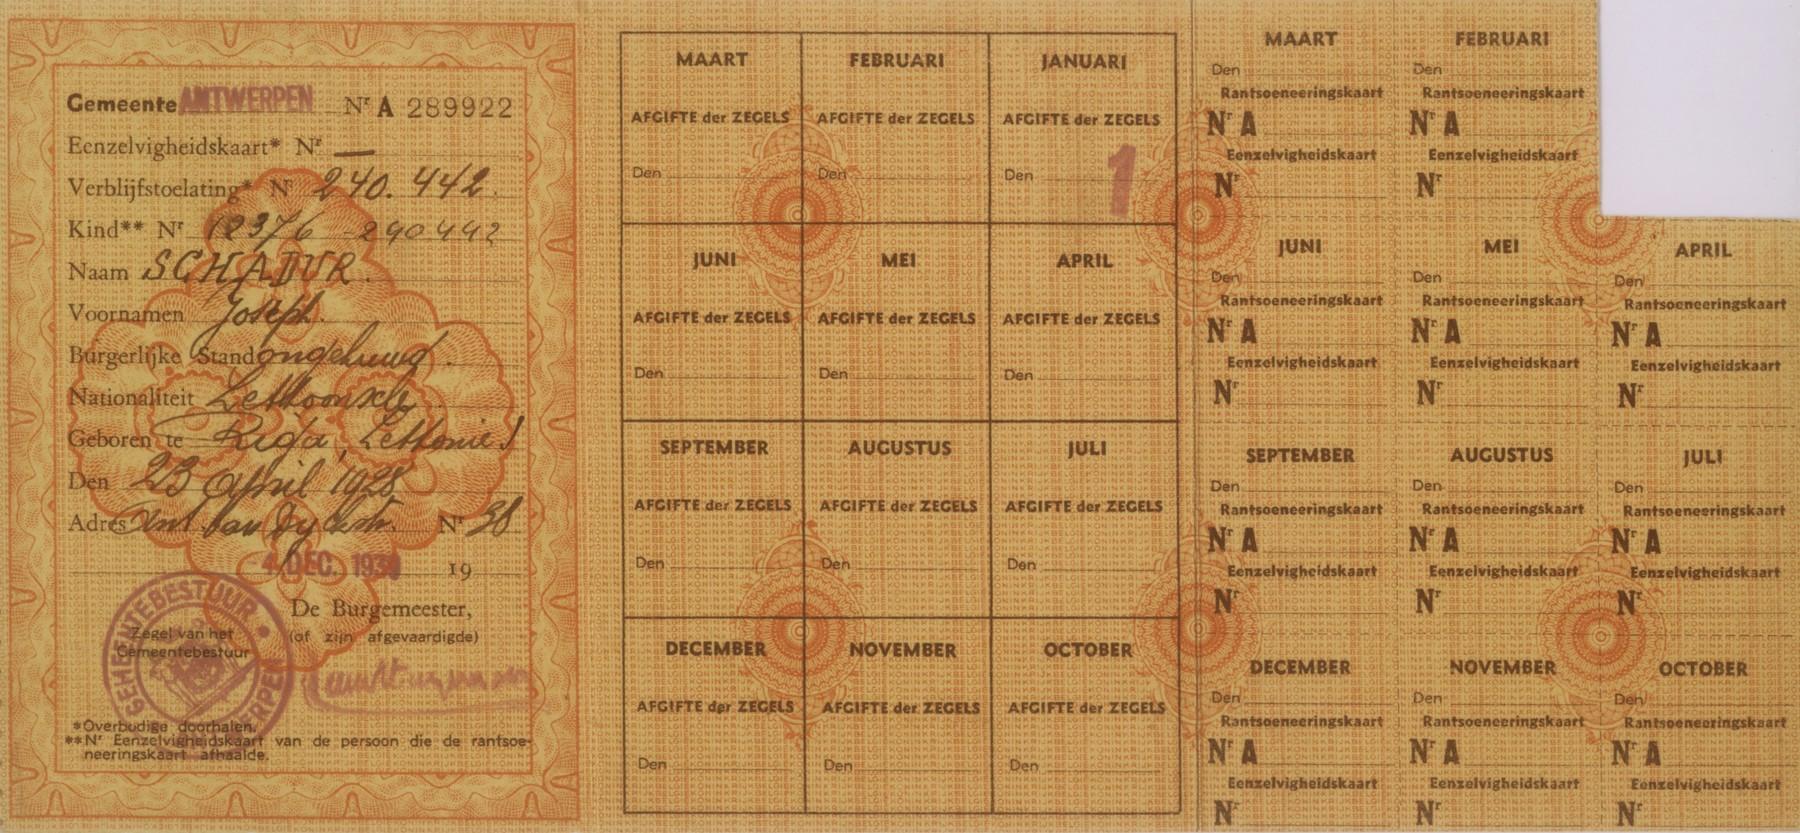 Ration card issued to Joseph Schadur, a Jewish refugee living in Antwerp.